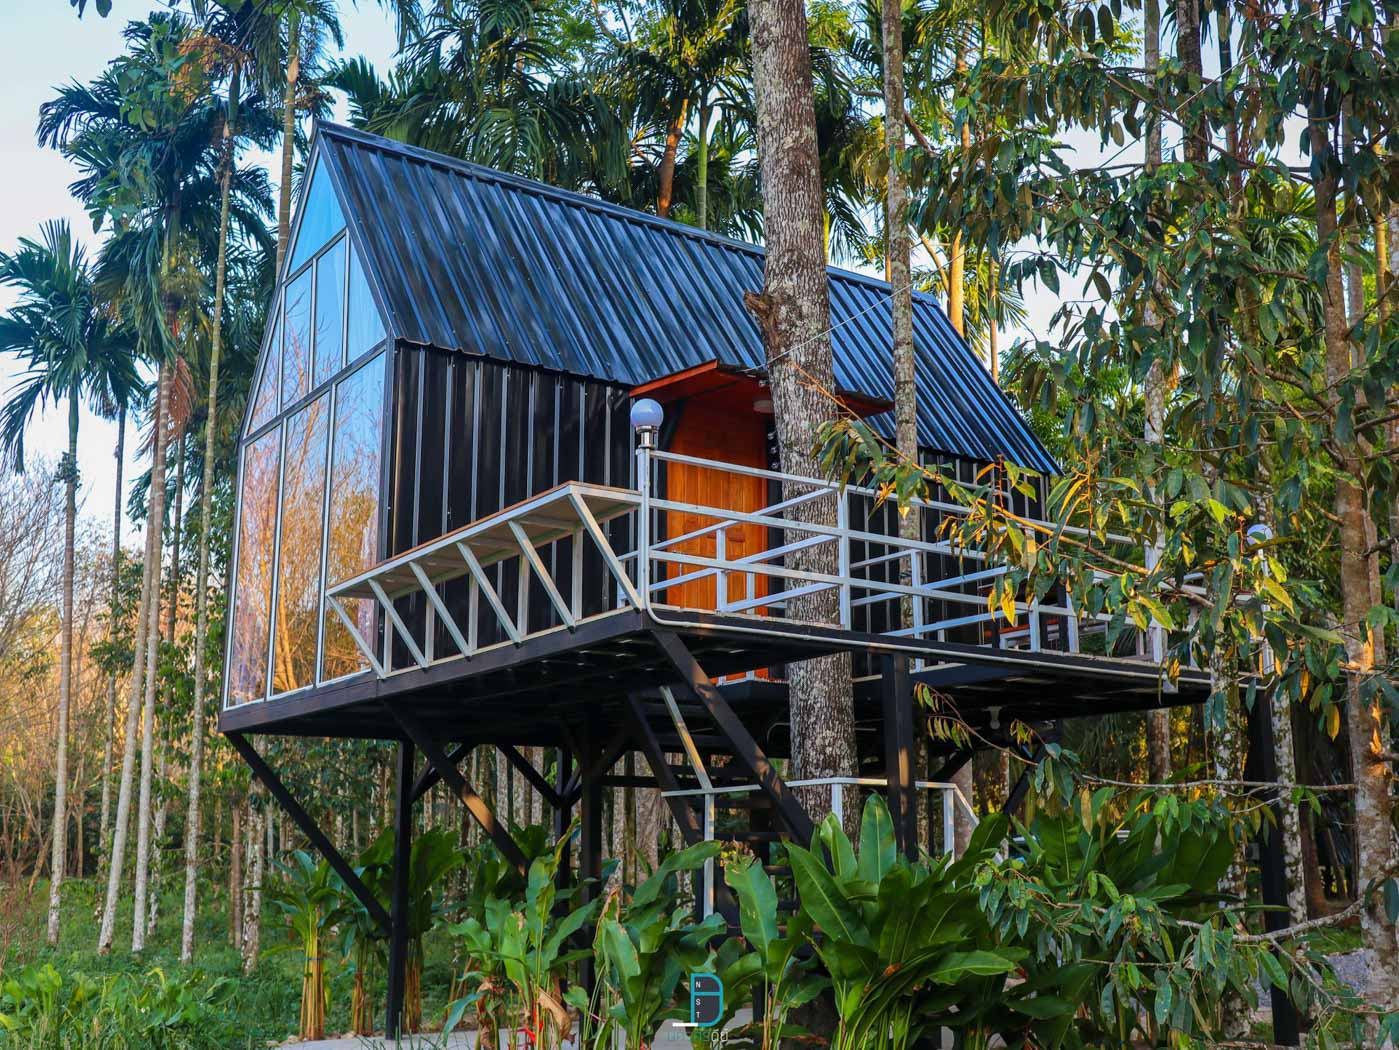 Lyn Cafe Copter Chill Resort จุดเช็คอินคาเฟ่สุดสวยพร้อมที่พักริมลำธาร at ช้างกลาง นครศรีดีย์